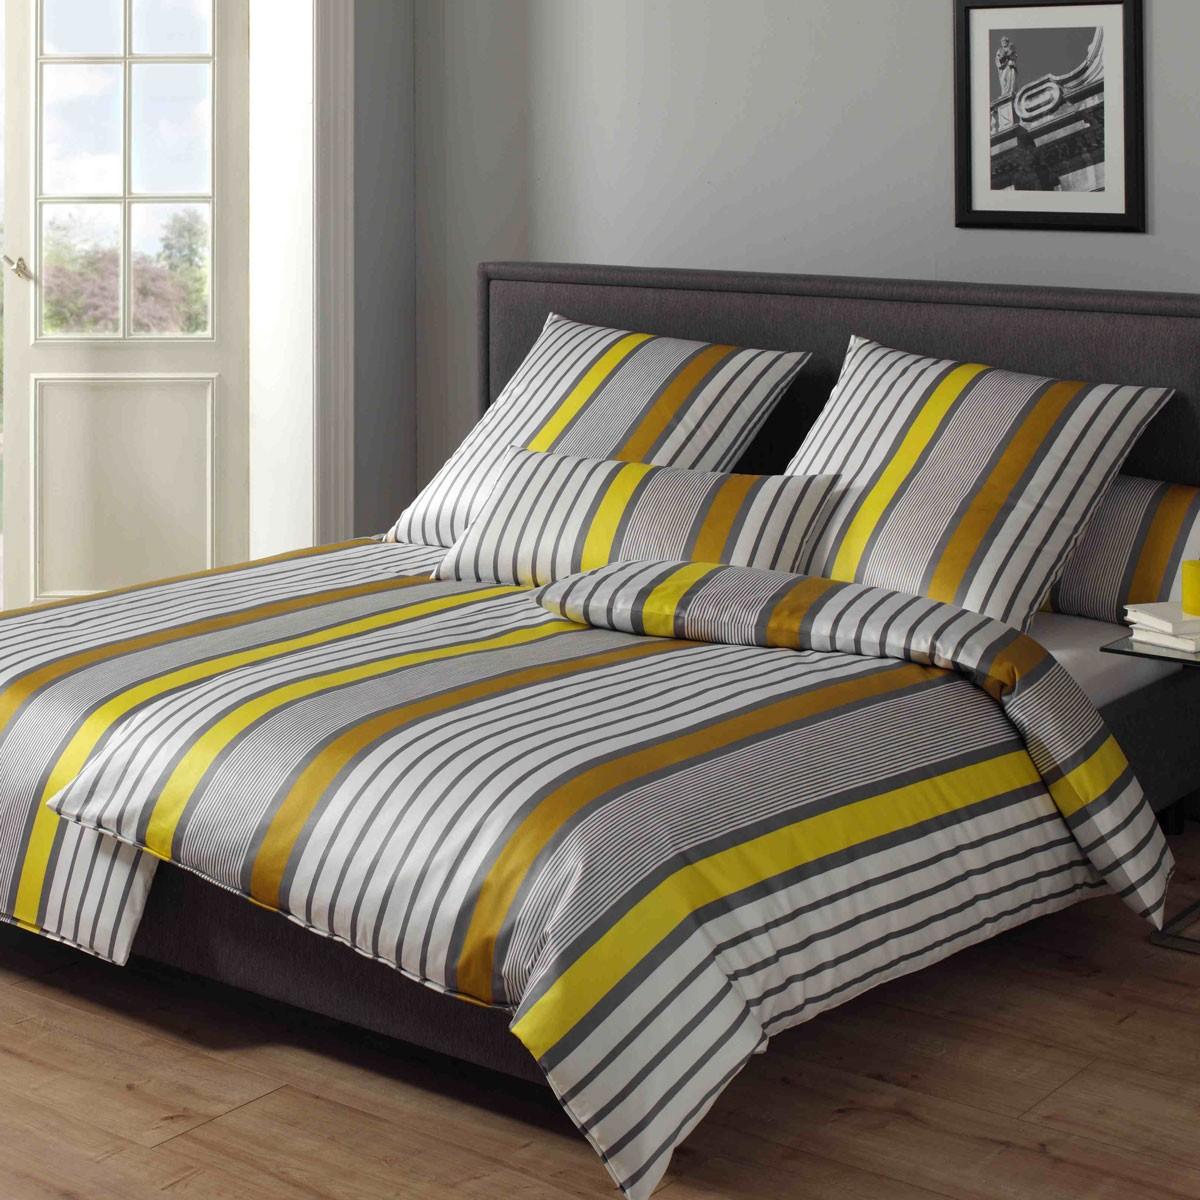 bettw sche elegante bondstreet 2073 gold. Black Bedroom Furniture Sets. Home Design Ideas